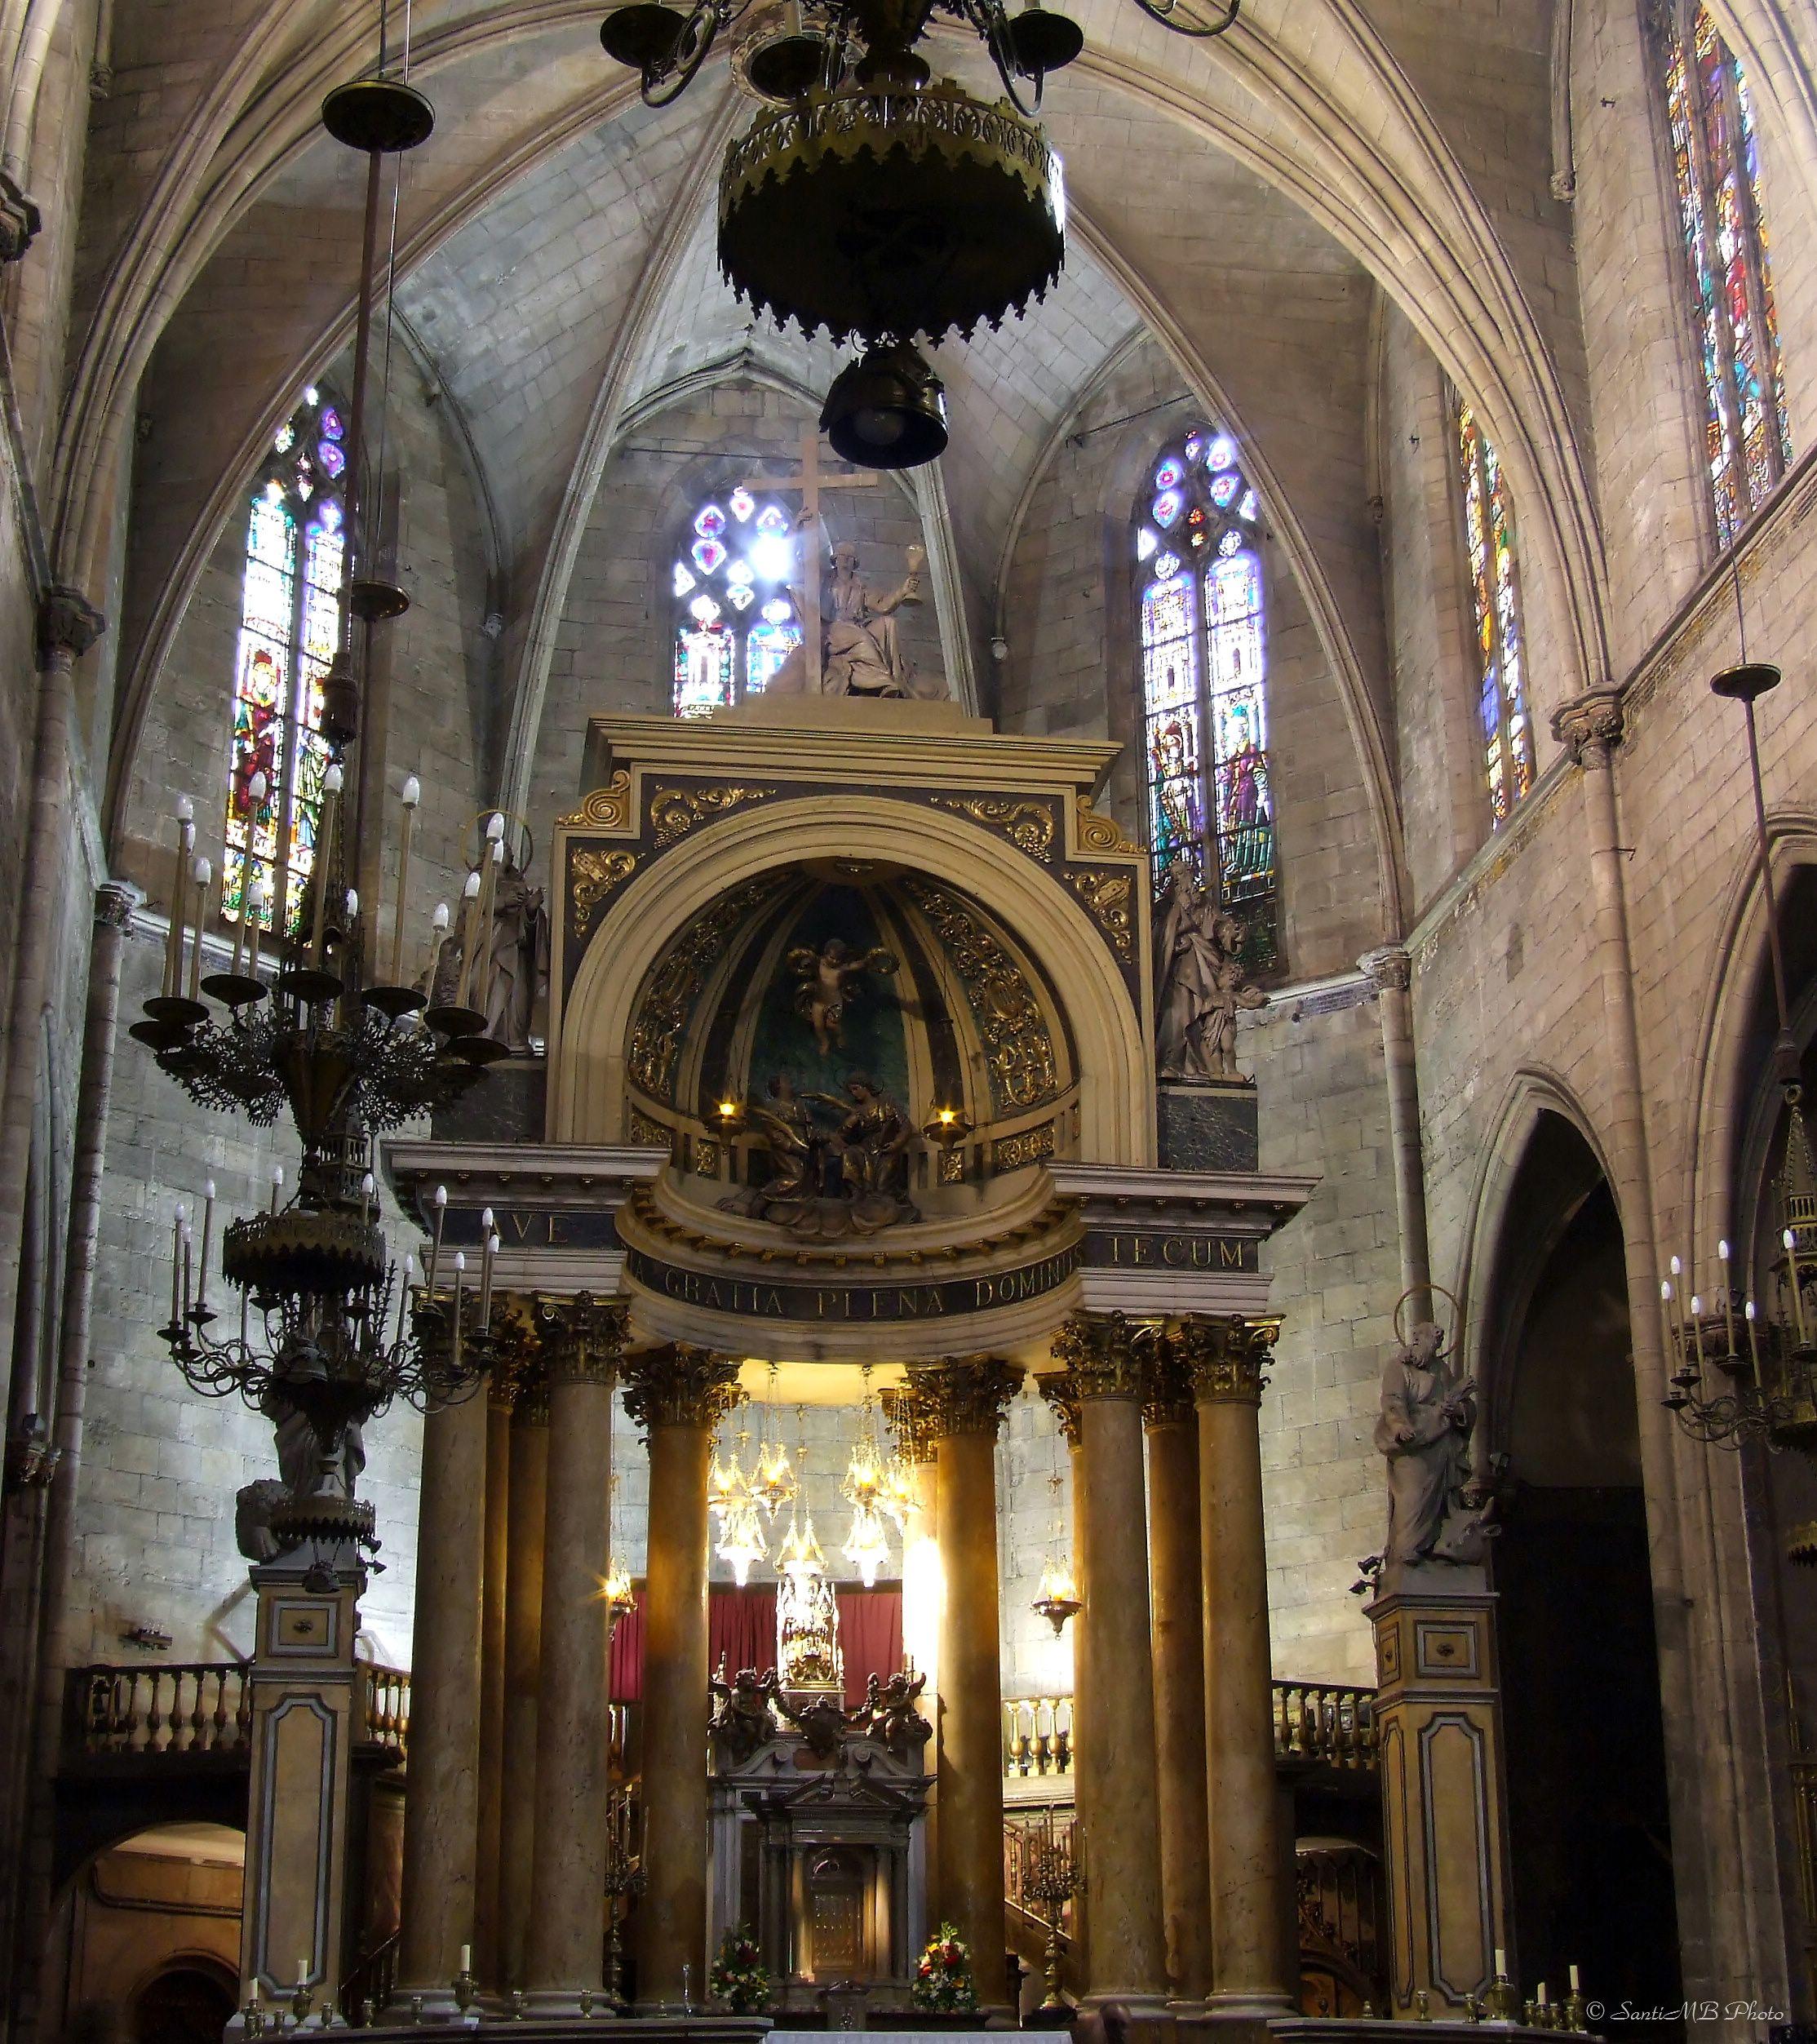 Fitxer esgl sia de sant just i pastor barcelona - Calle montserrat barcelona ...